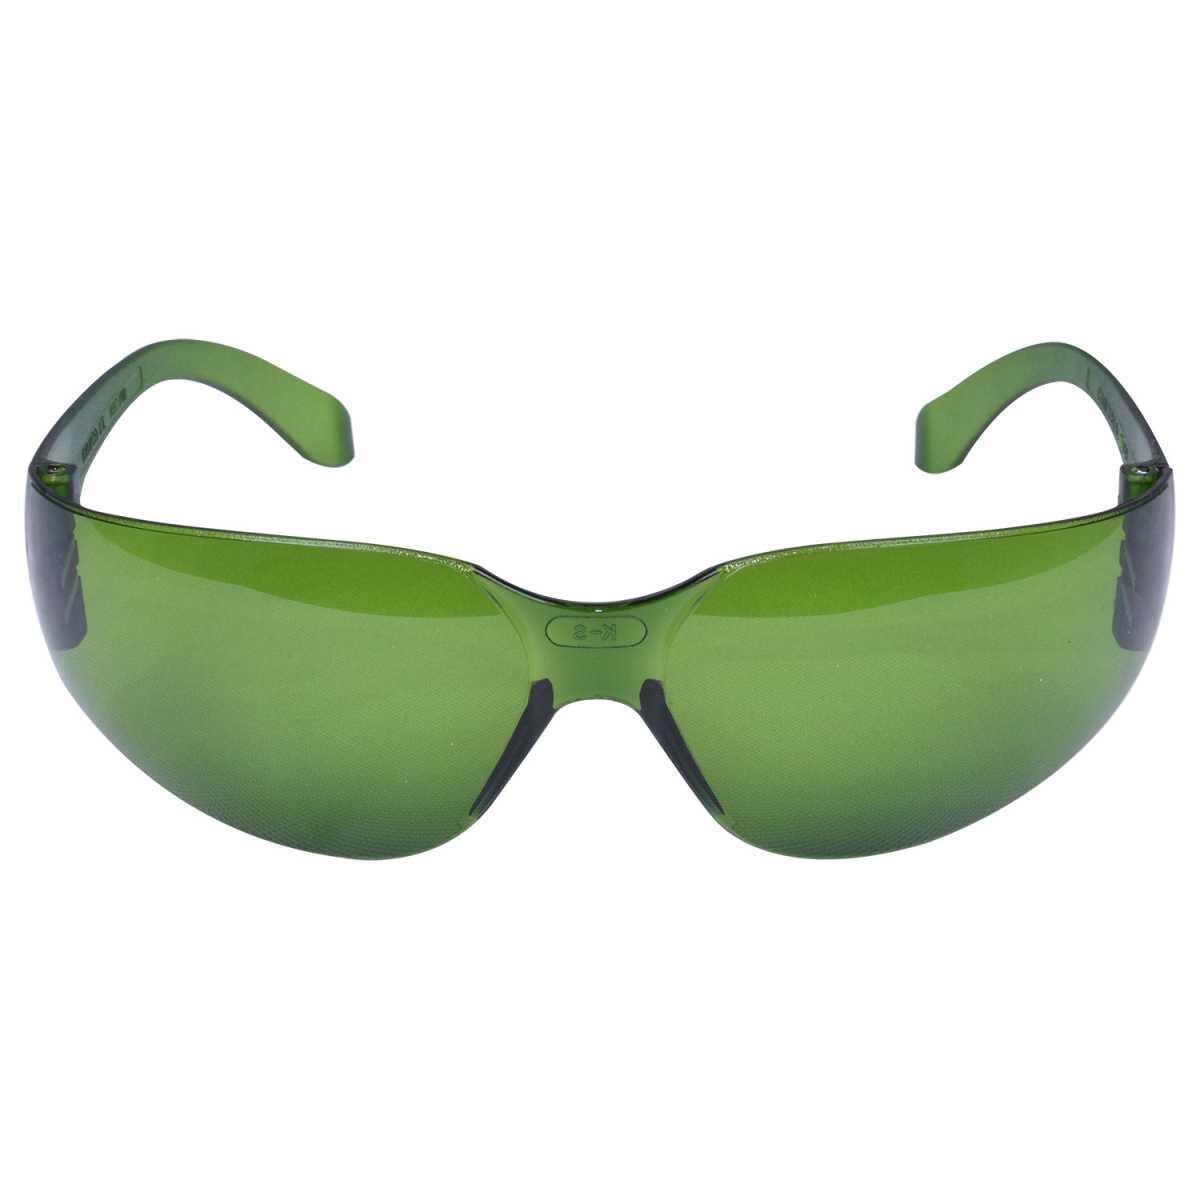 Óculos de Segurança Verde Leopardo Kalipso